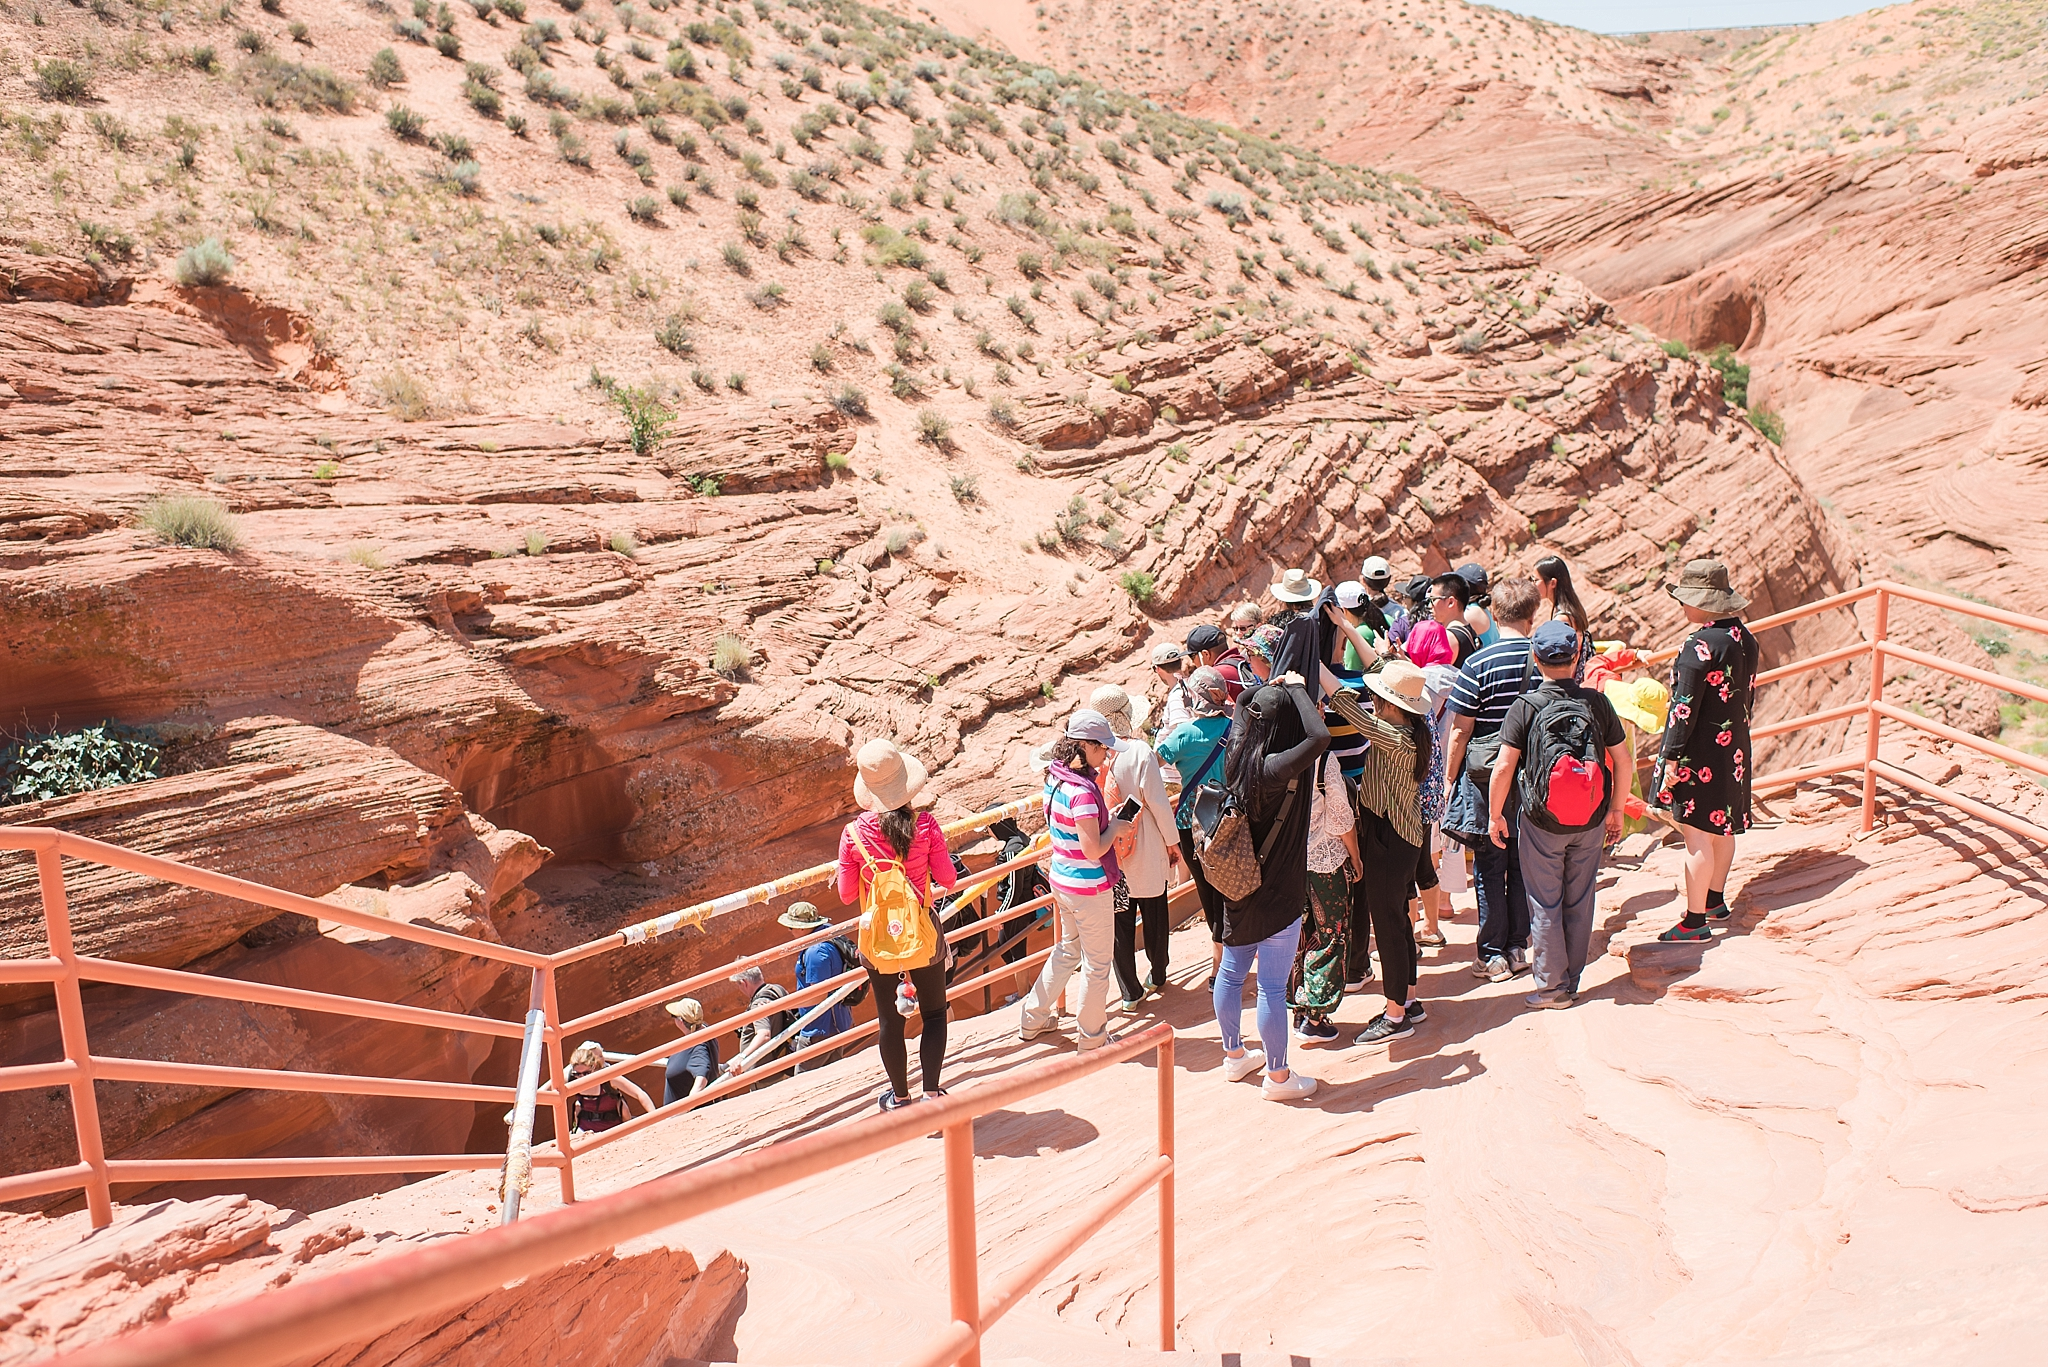 The line to climb down into Lower Antelope Canyon, near Page, Arizona. Photo by Jade Min Photography.